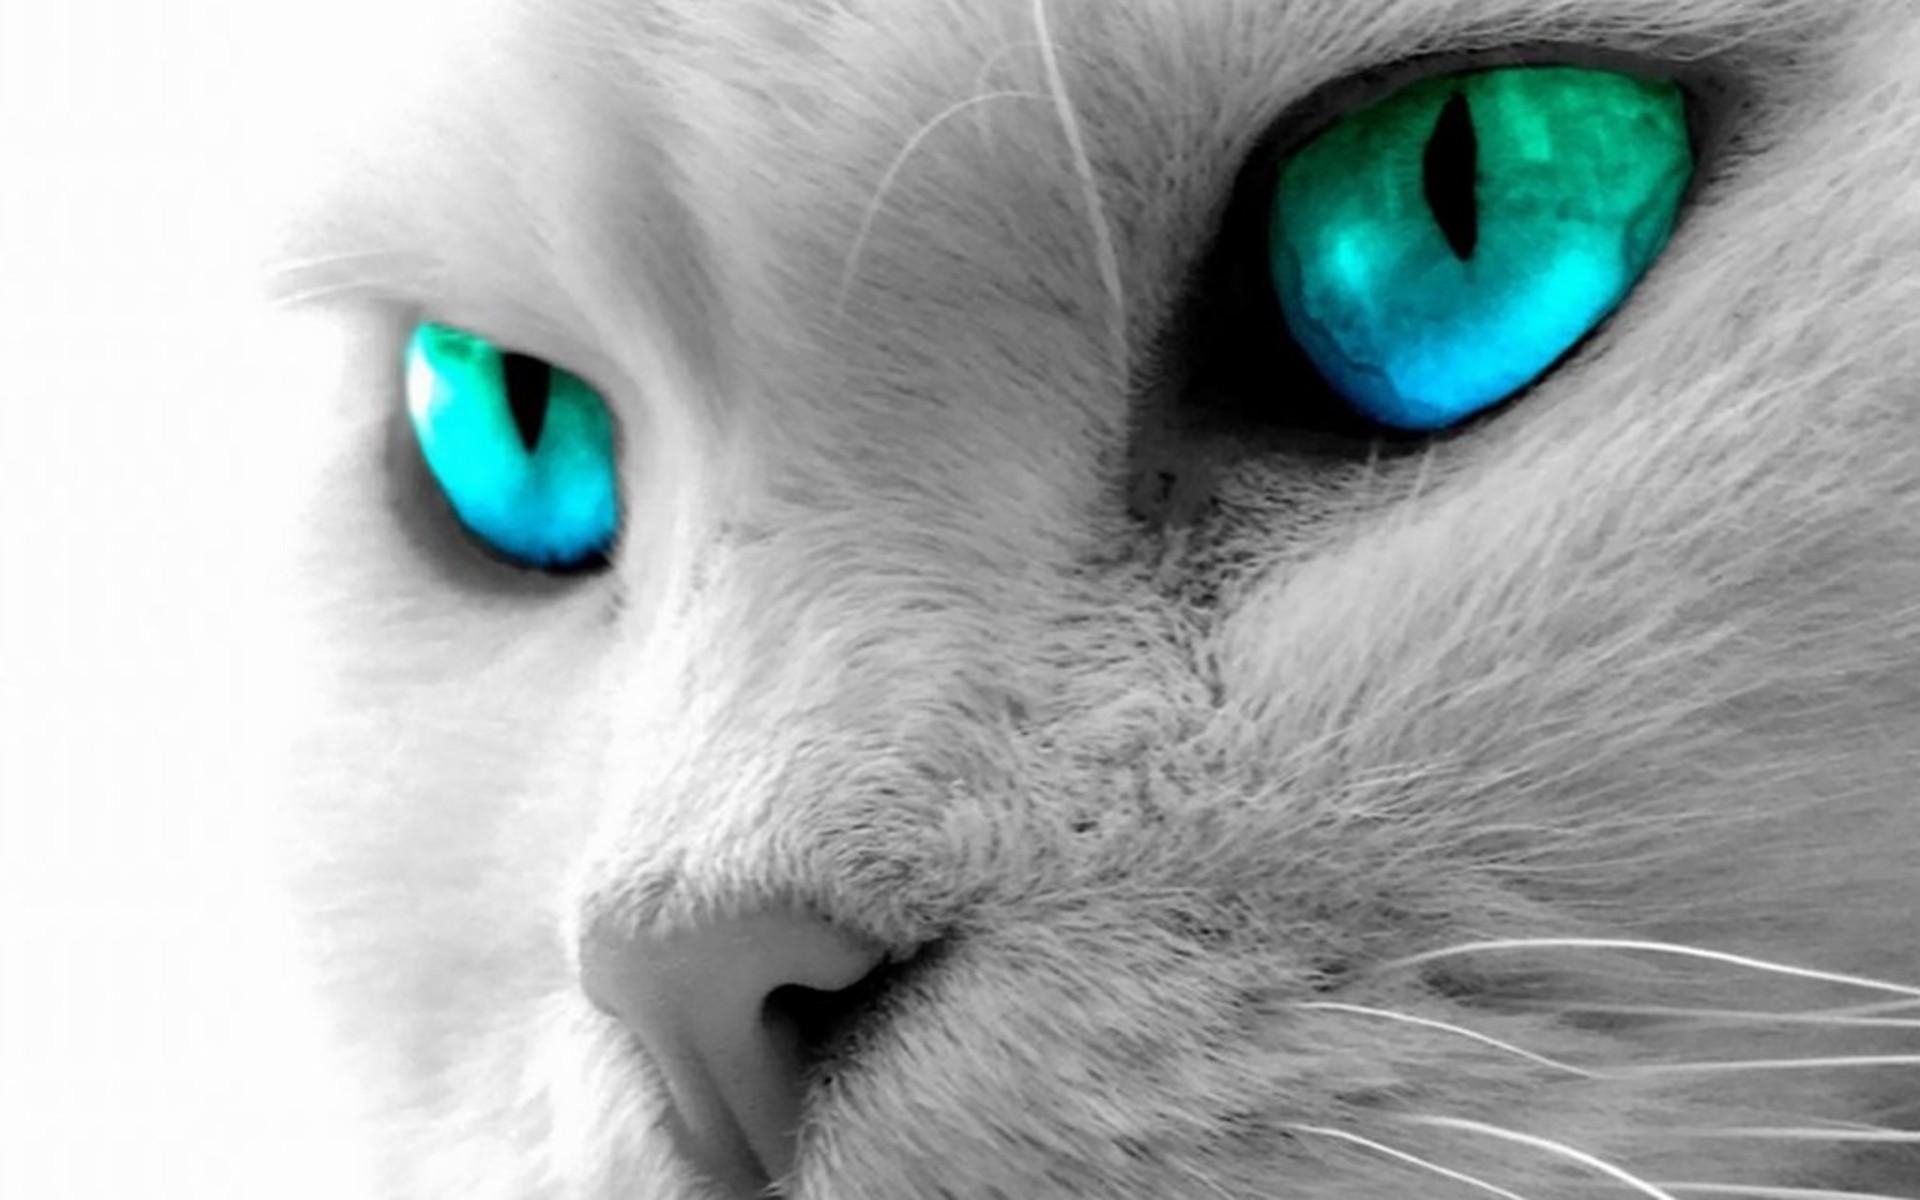 White Cat Monochrome Blue Eyes Nose Whiskers Eye Mammal Black And Human Body Organ Close